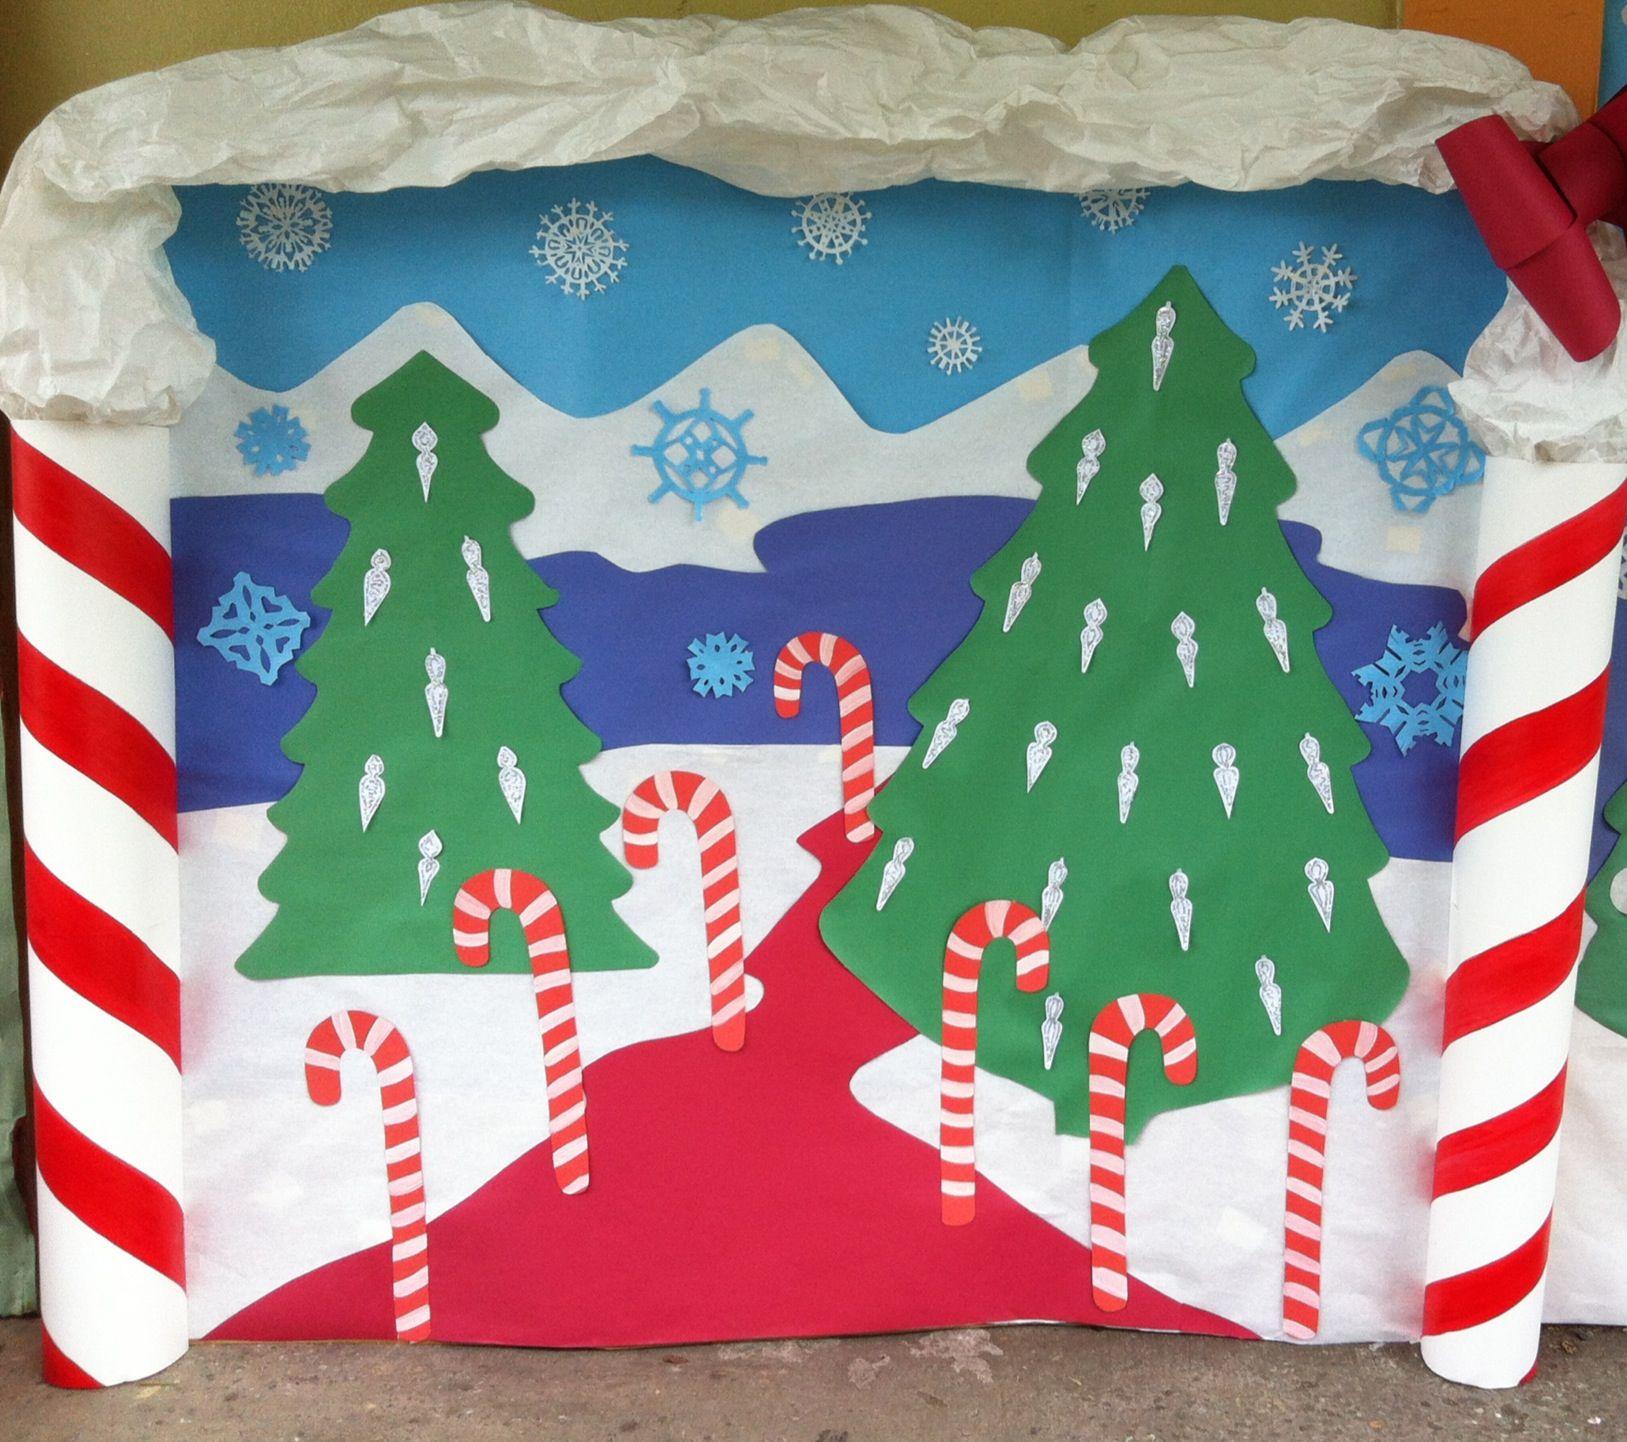 Christmas School decorations | Classroom Displays/Decorations ...